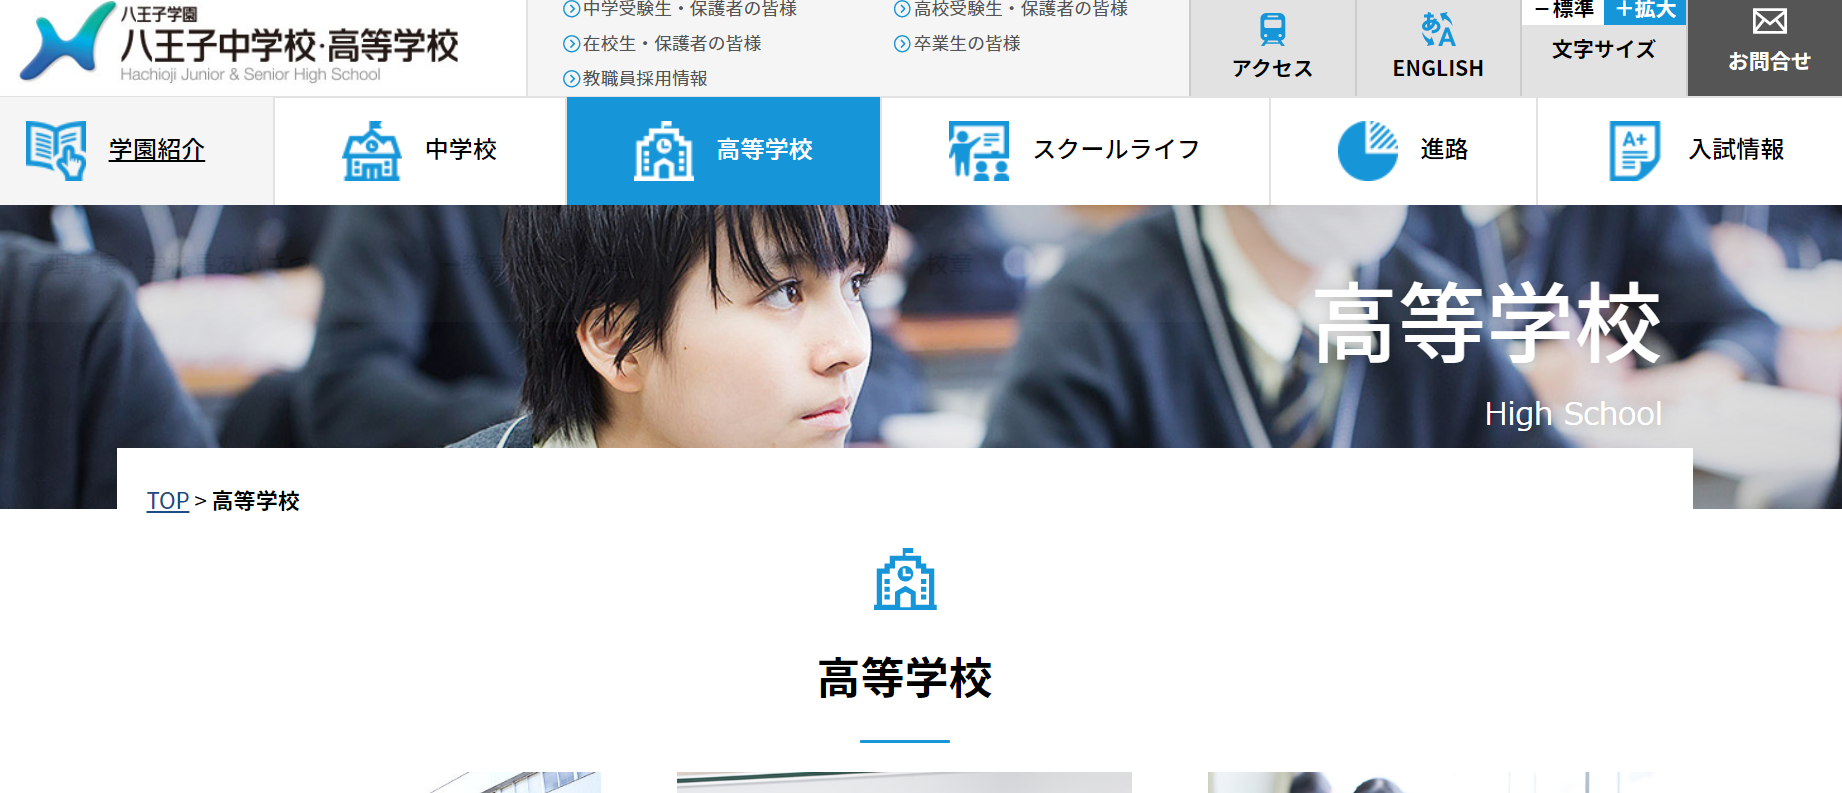 八王子高校の口コミ・評判